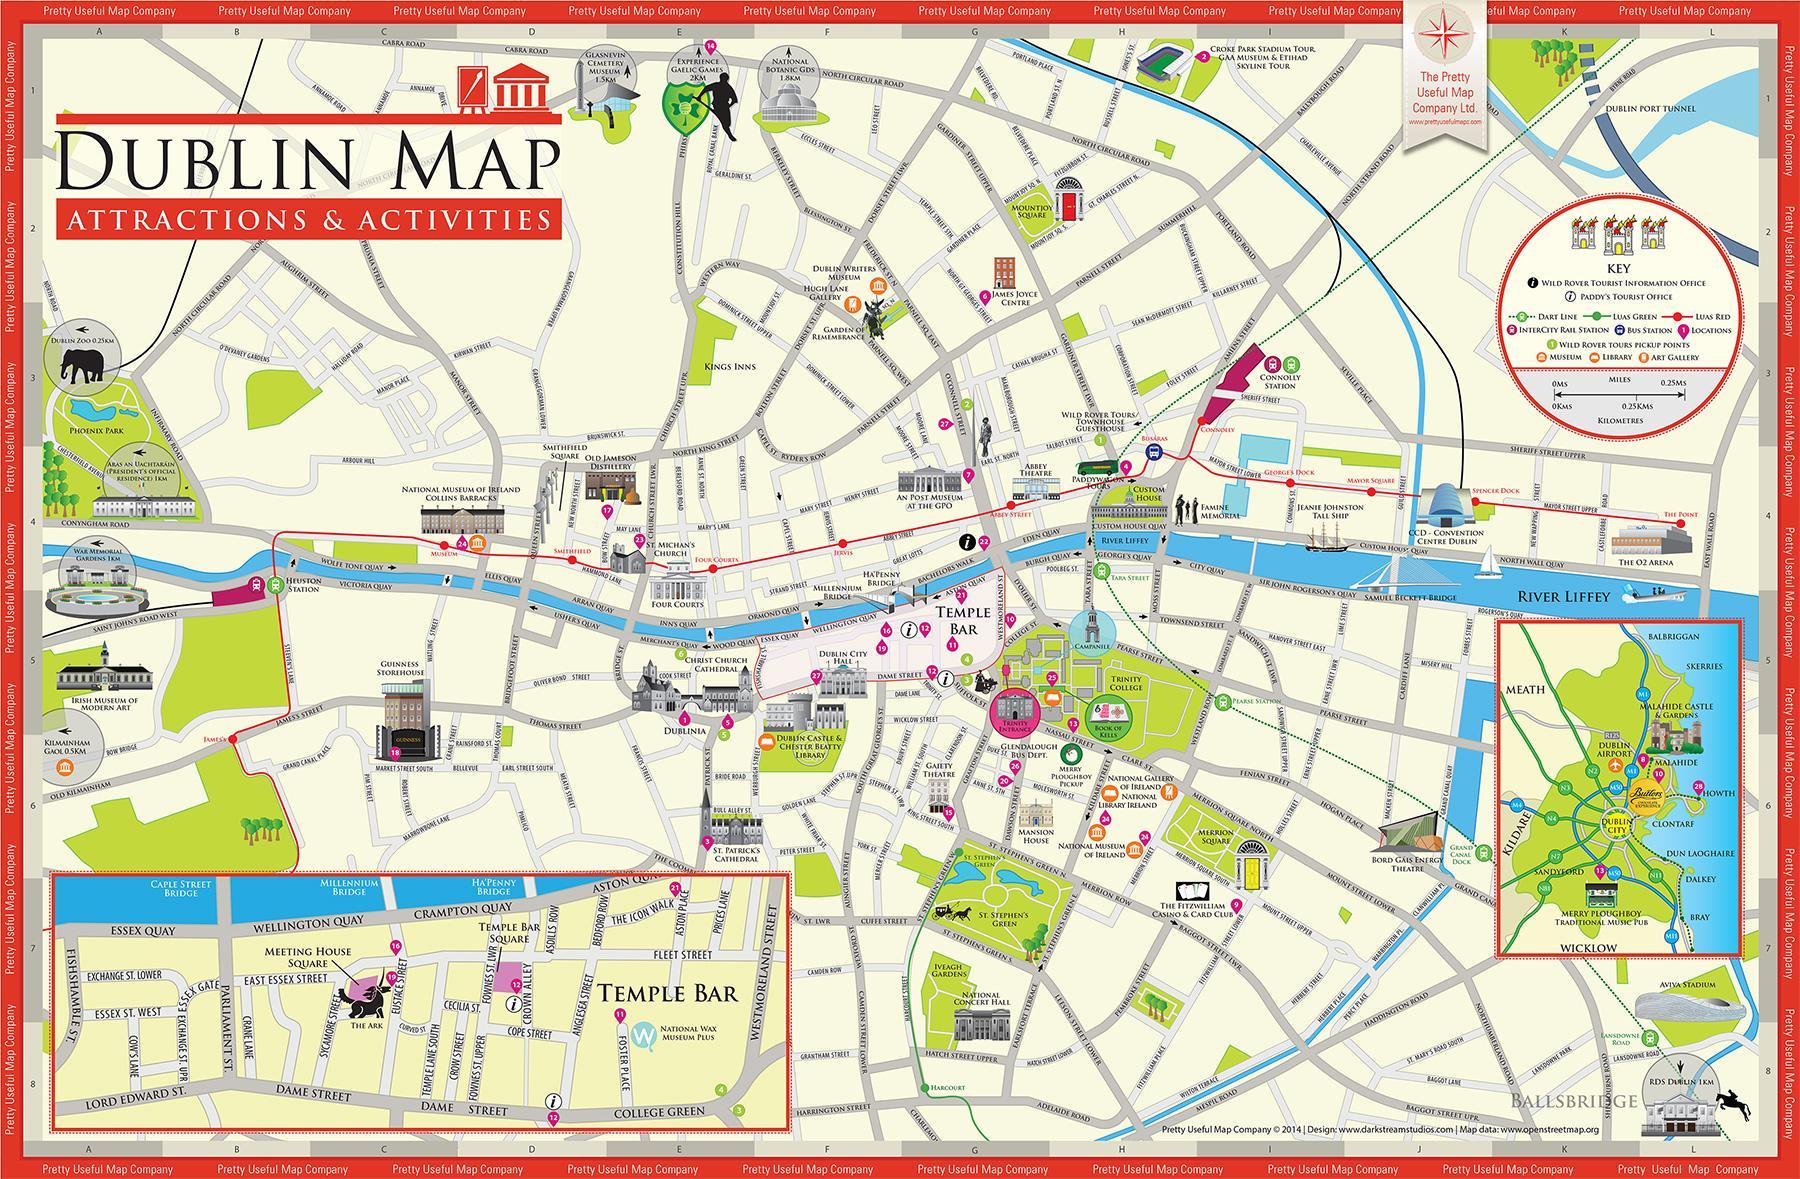 Map Of Dublin City Centre - Dublin City Centre Map (Ireland) - Dublin City Map Printable